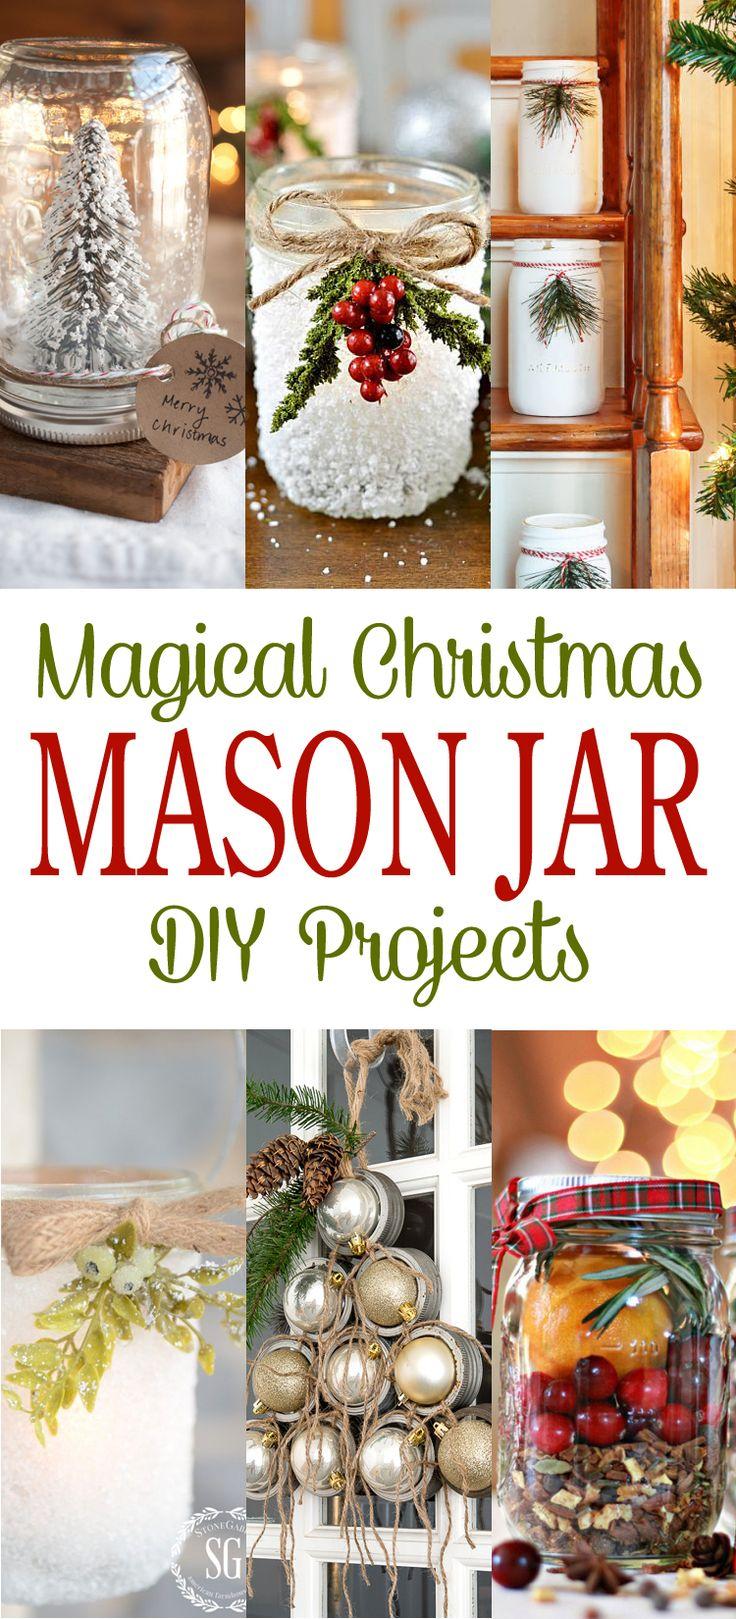 Magical Christmas Mason Jar DIY Projects!